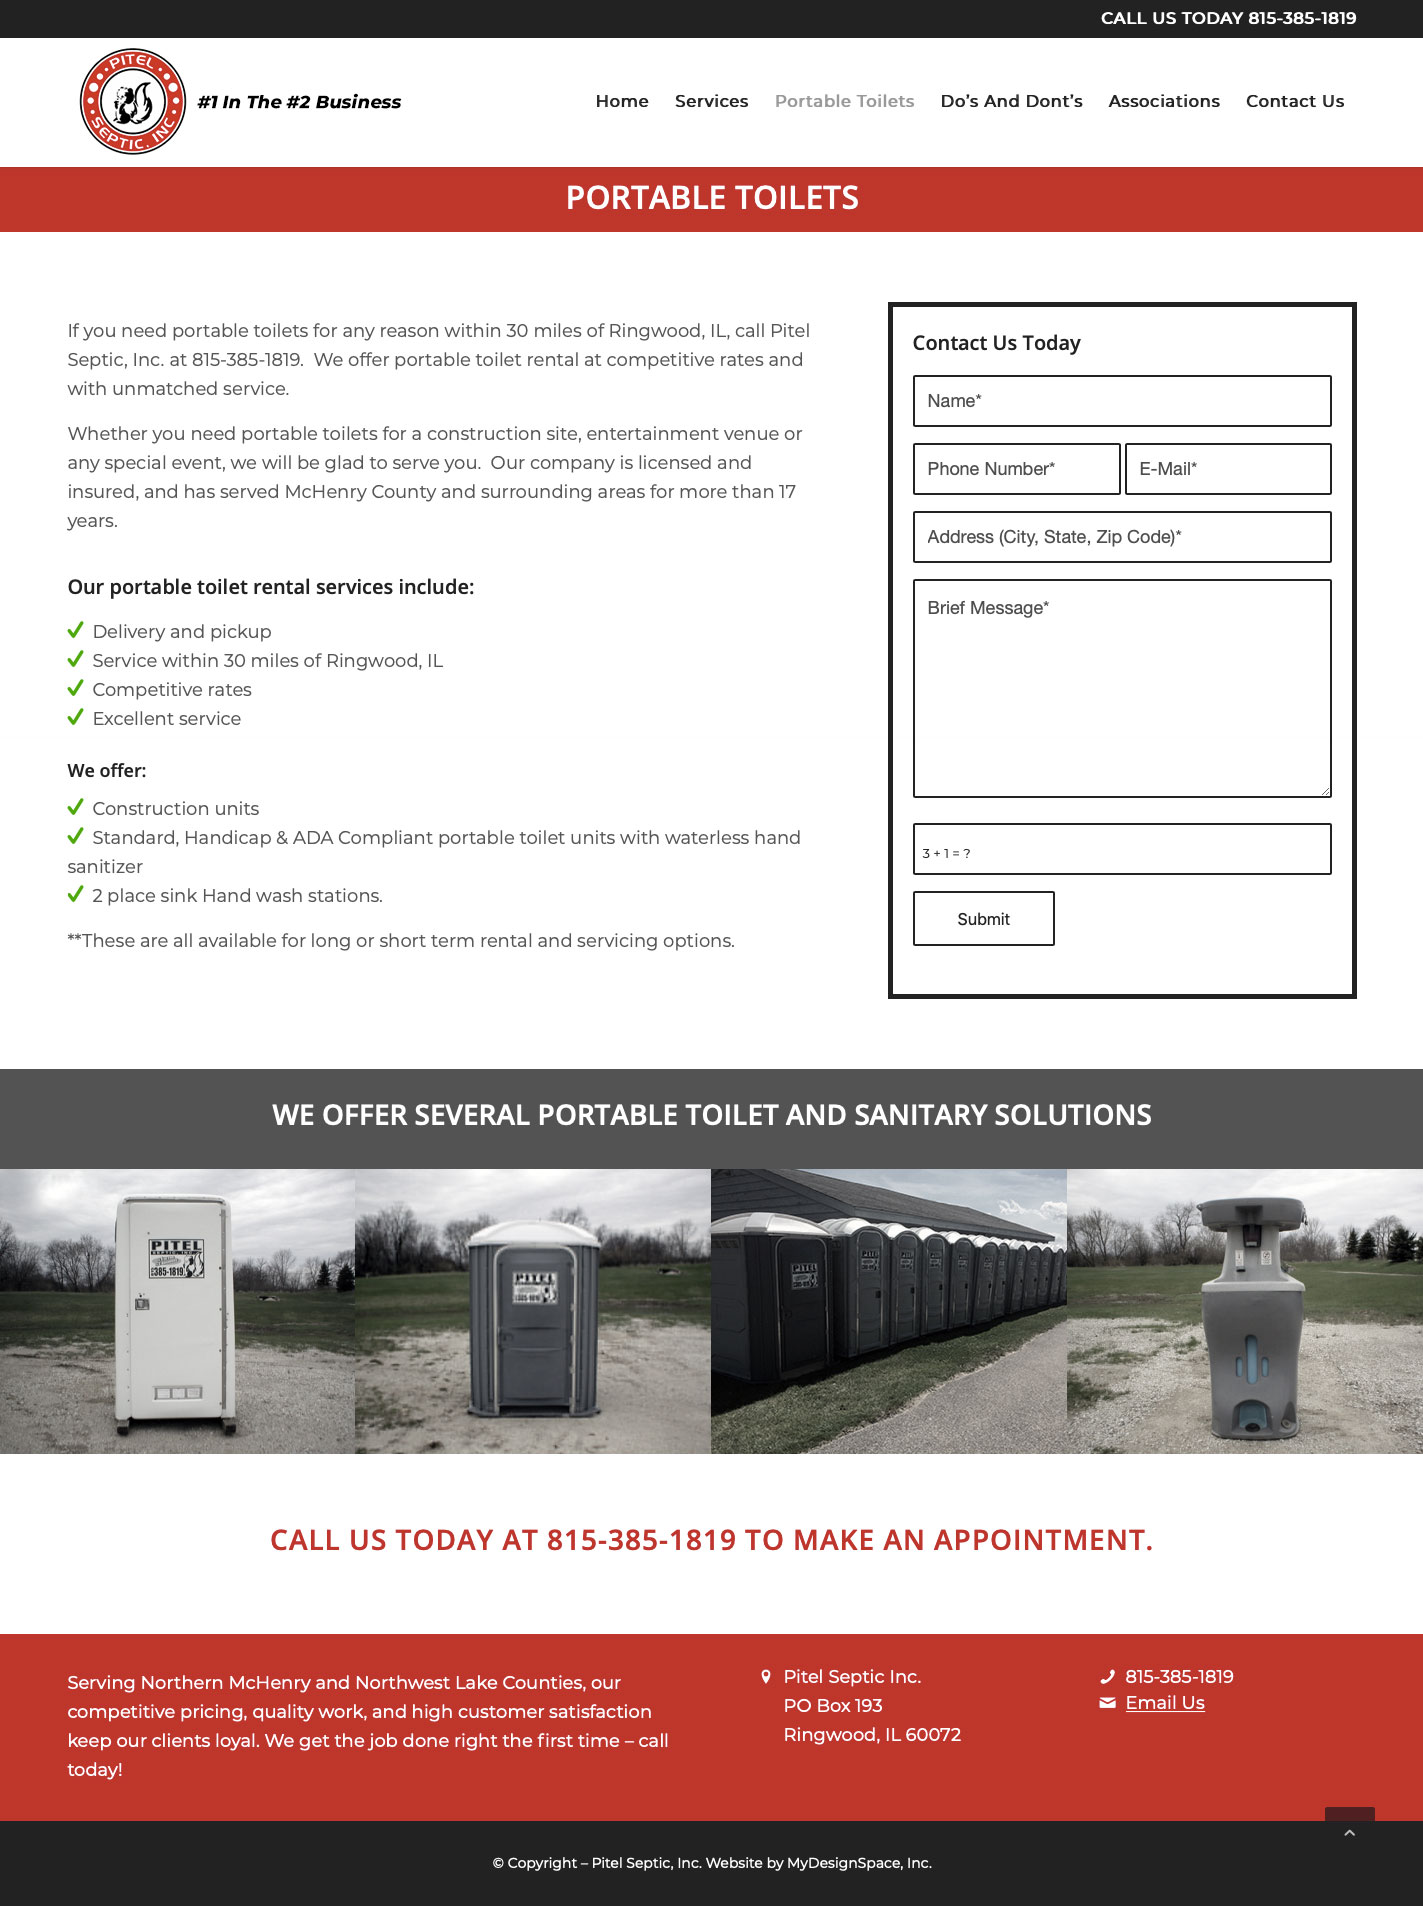 Pitel Septic Portable Toilets Page